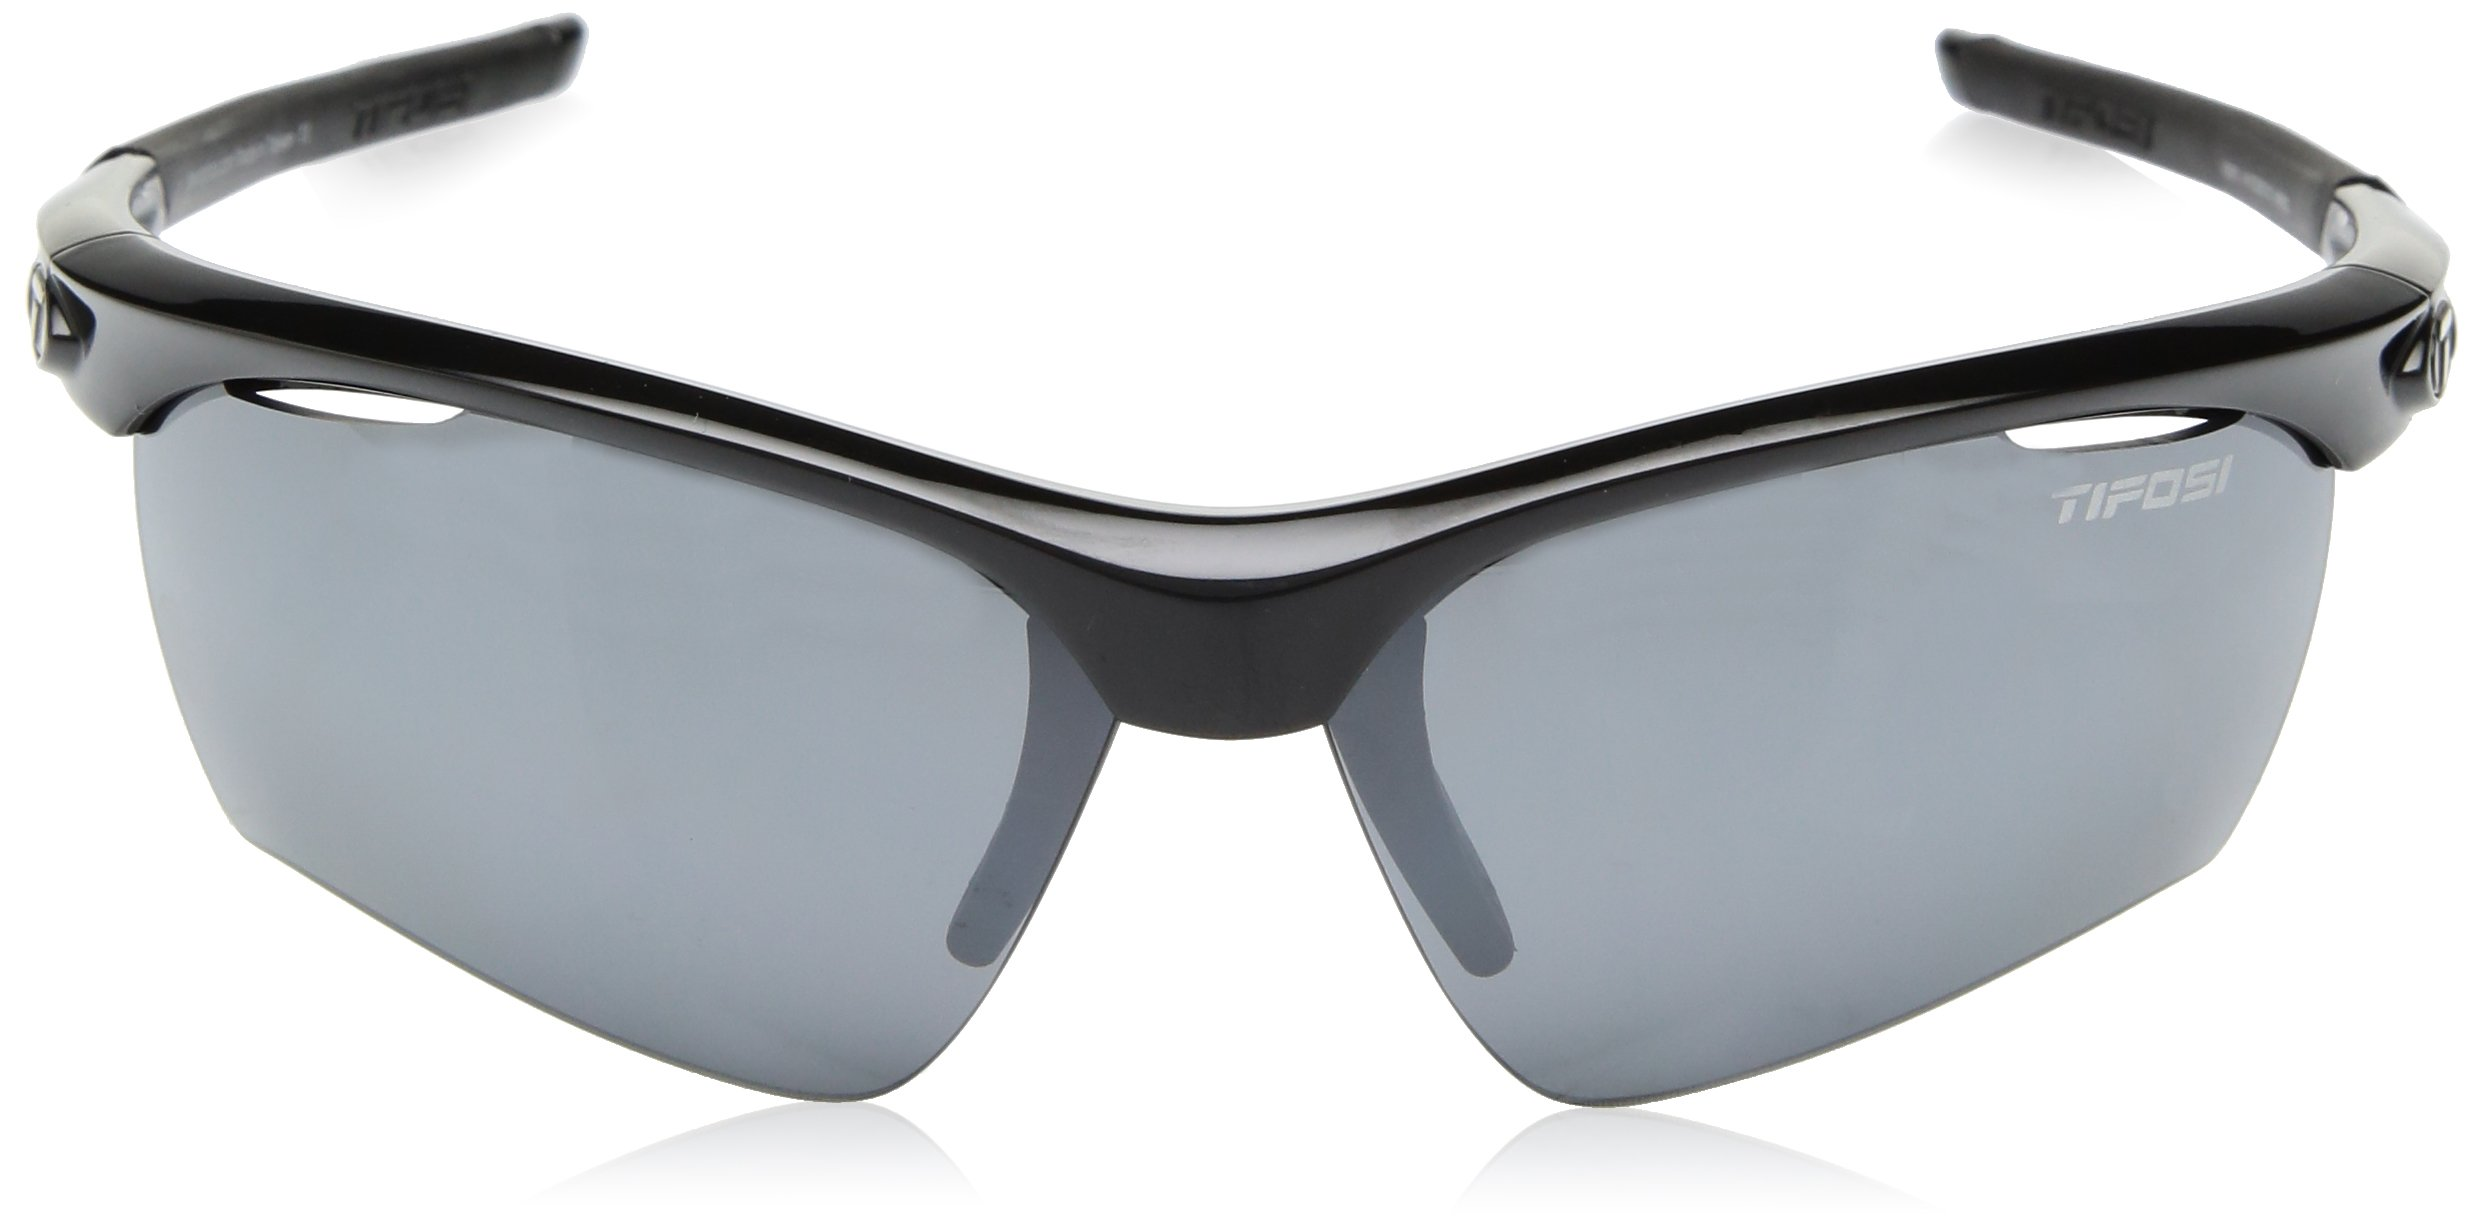 Tifosi Vero Wrap Sunglasses, Gloss Black, 63.8 mm by Tifosi (Image #2)